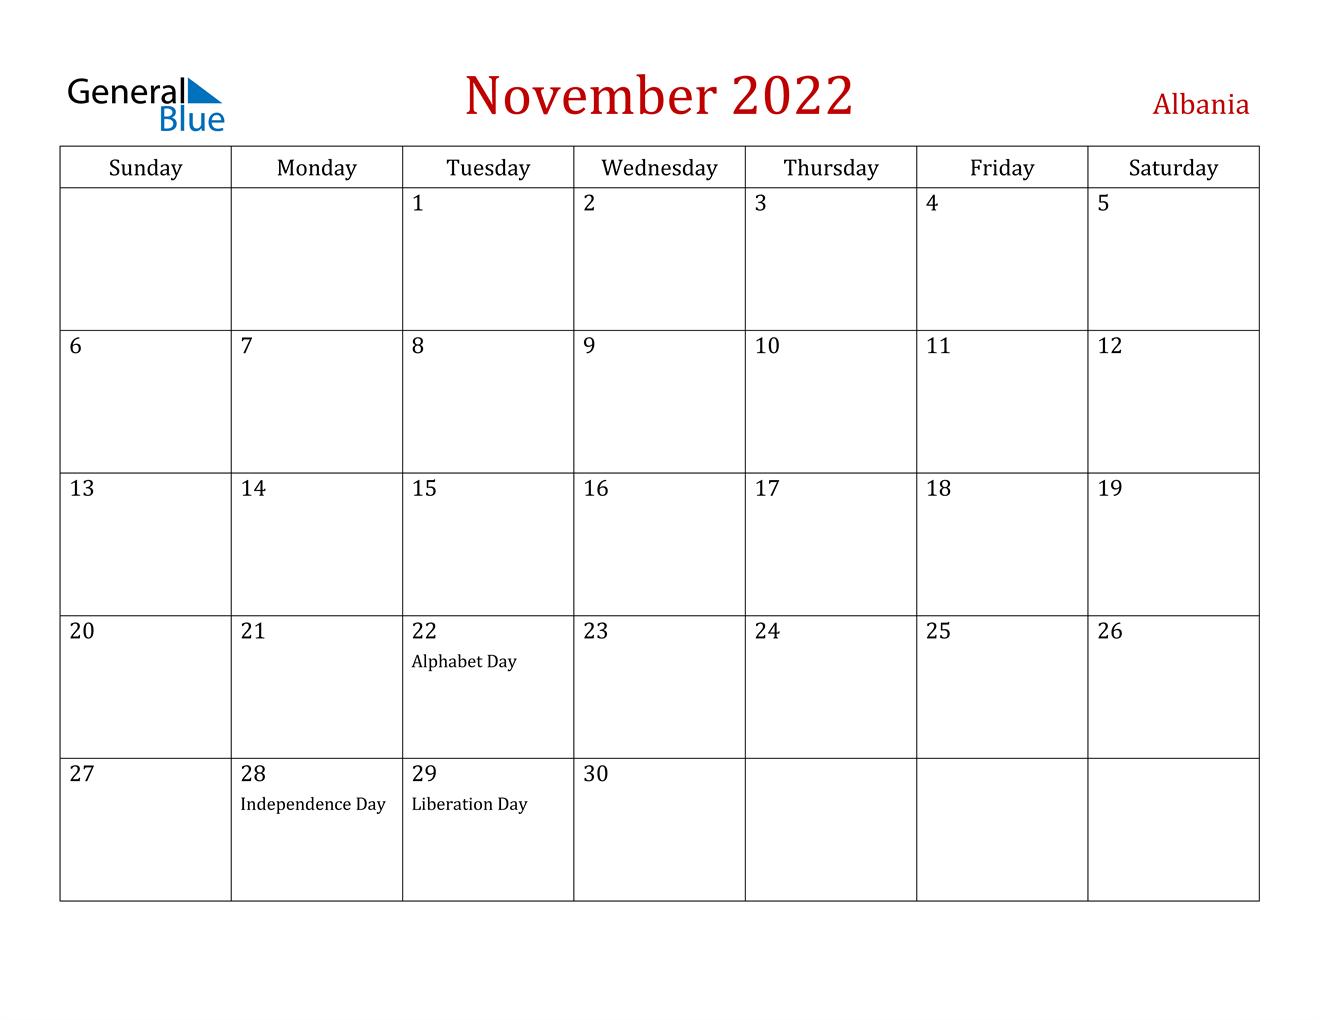 November 2022 Calendar - Albania